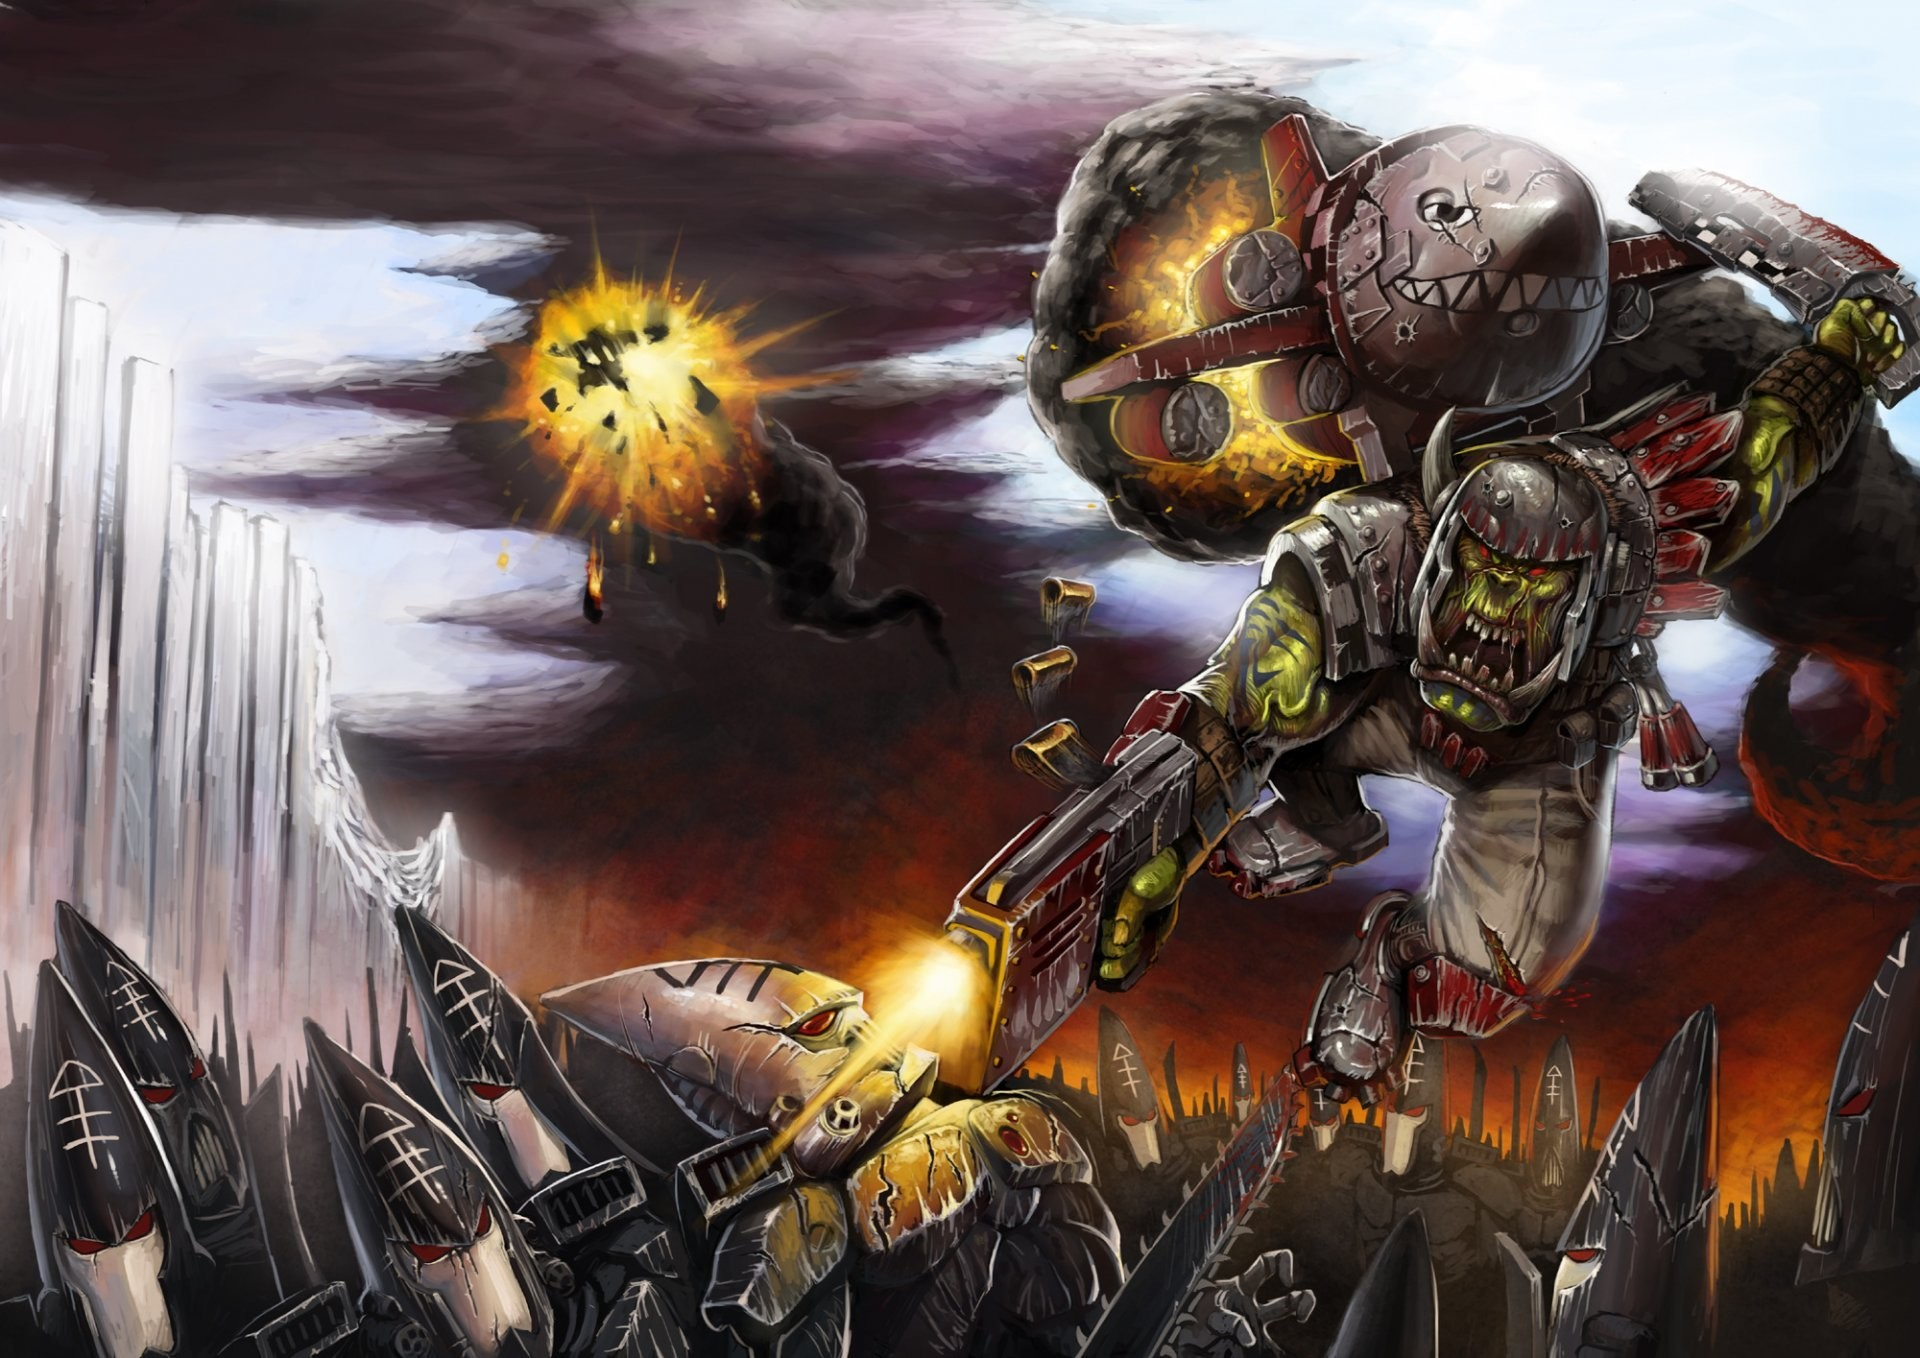 warhammer 40k eldar men ork stormtroopers rocket satchel the helmet . sword  bolter smoke fire